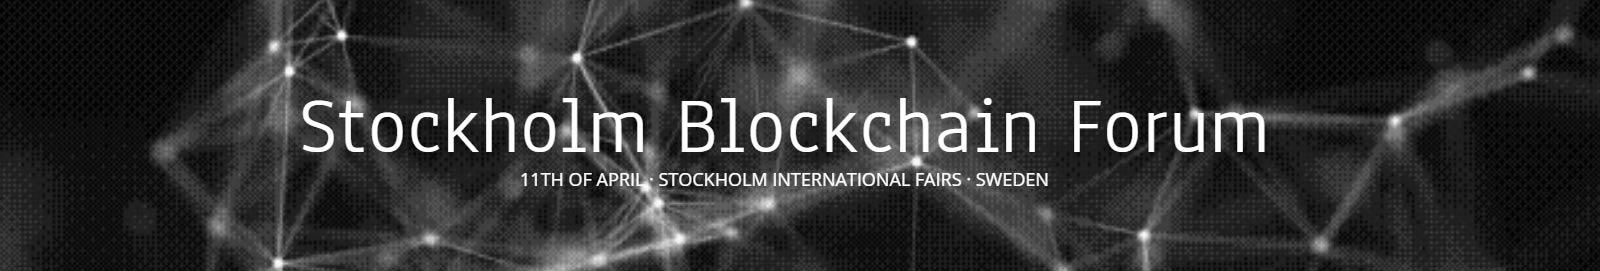 AE-at-Stockholm-Blockchain-forum-banner